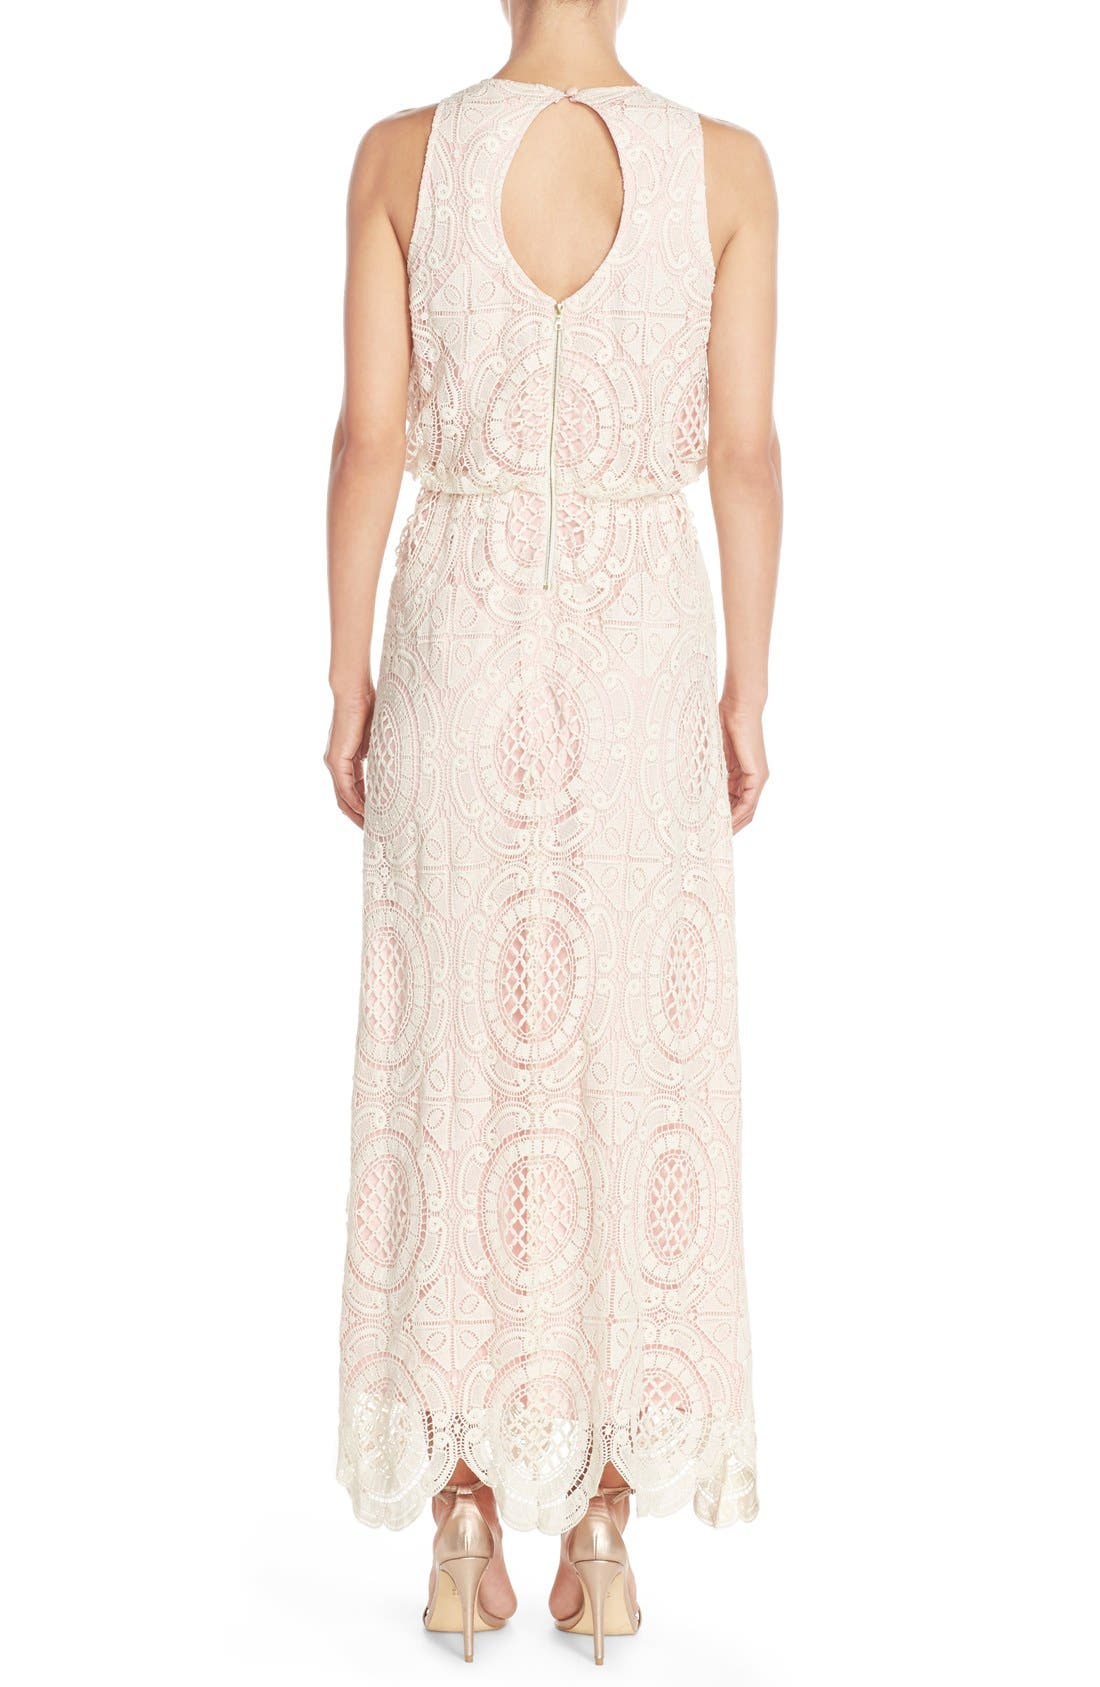 Lace Blouson Maxi Dress,                             Alternate thumbnail 2, color,                             251